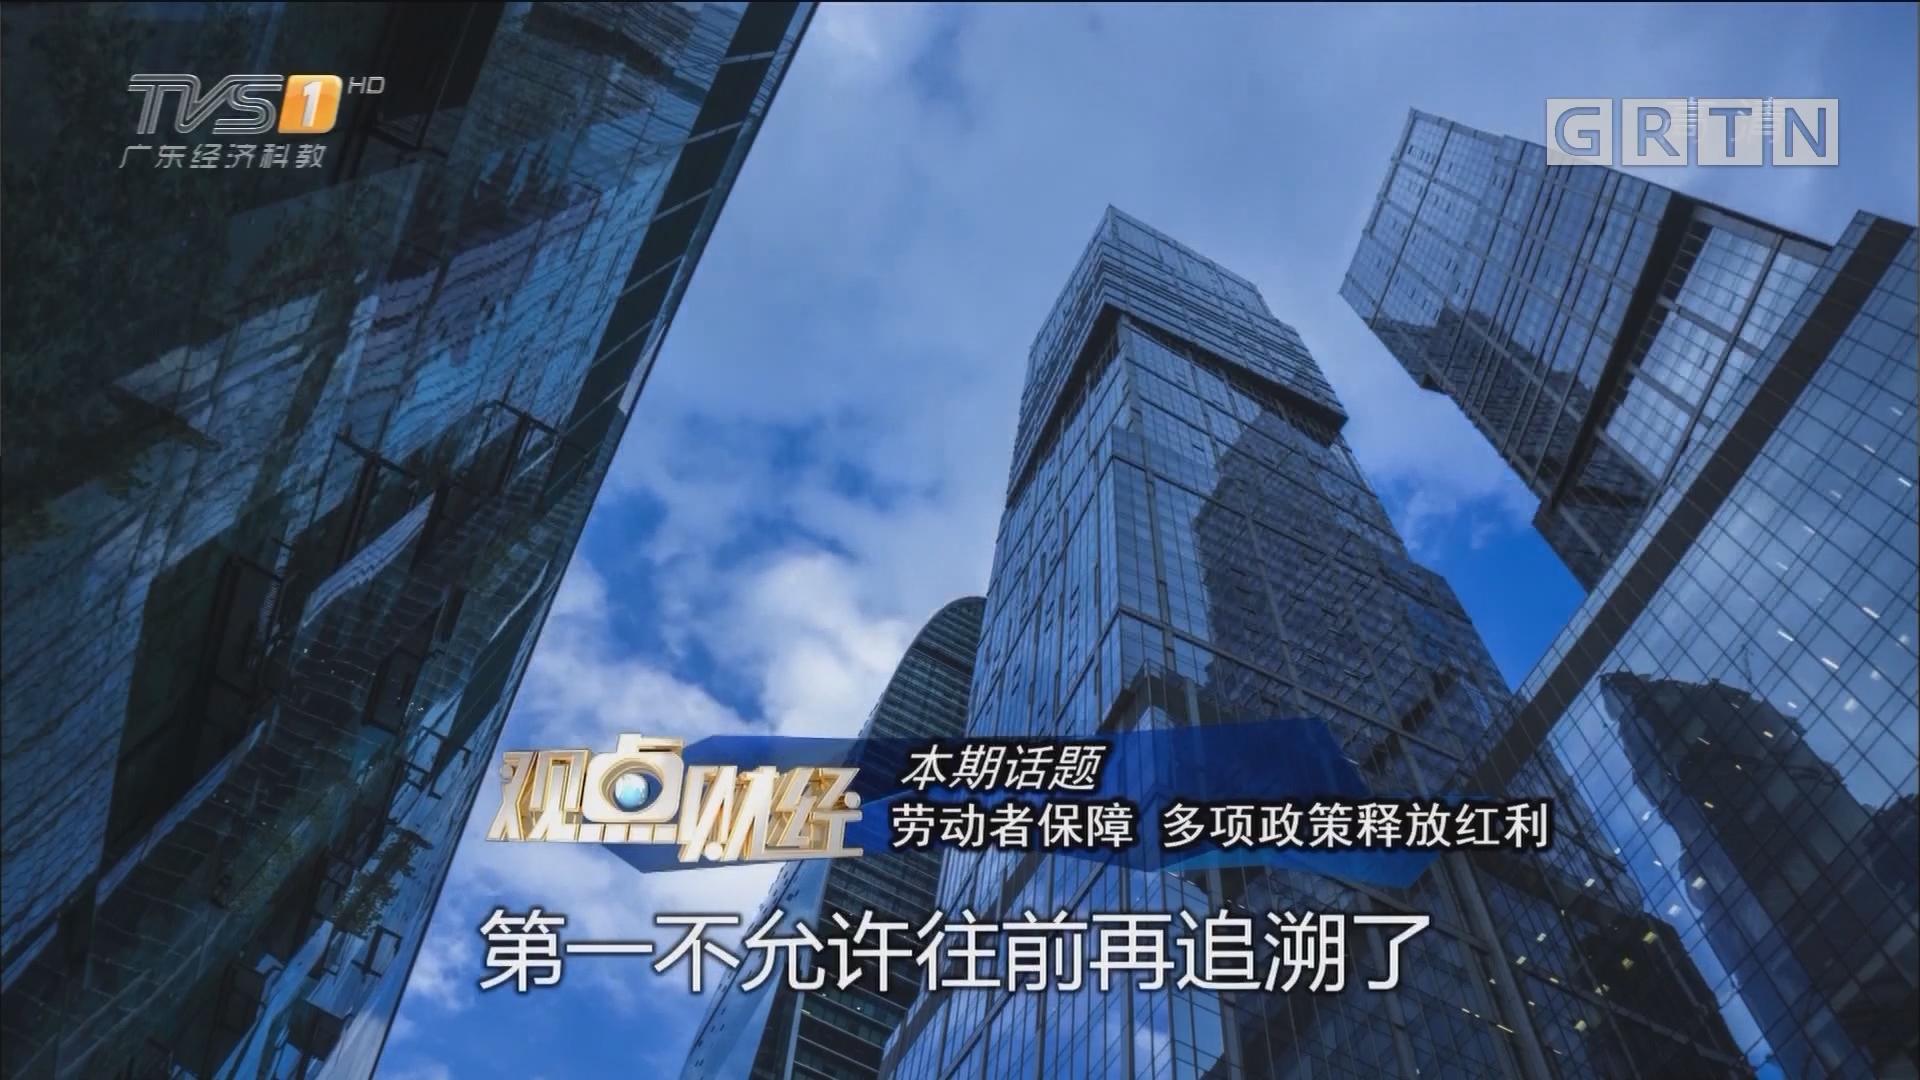 [HD][2019-03-10]观点财经:劳动者保障 多项政策释放红利